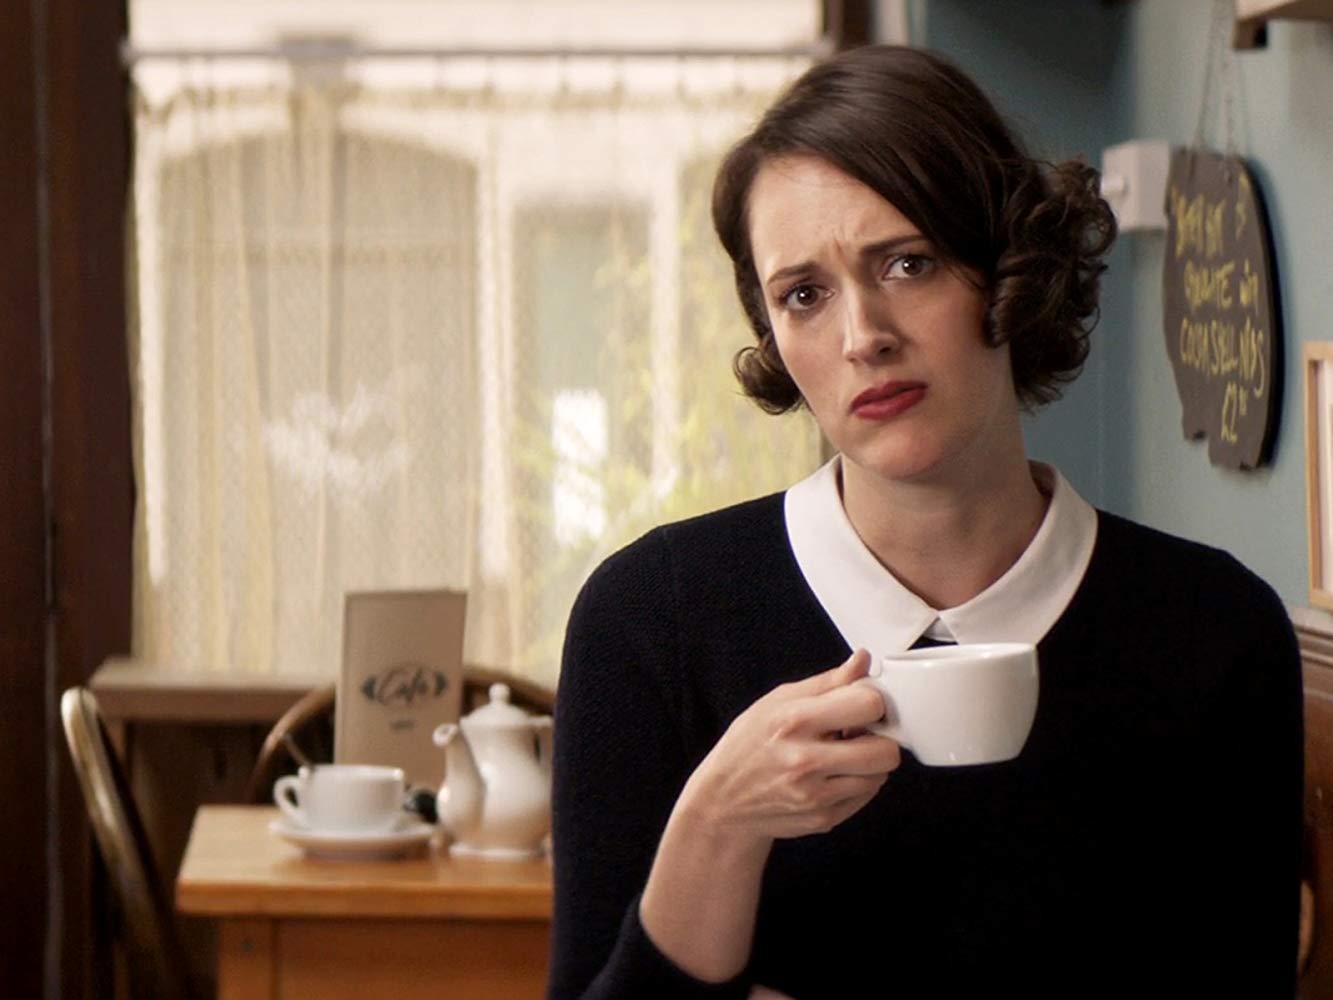 Fleabag': Phoebe Waller-Bridge Says No Need for a Third Season | IndieWire